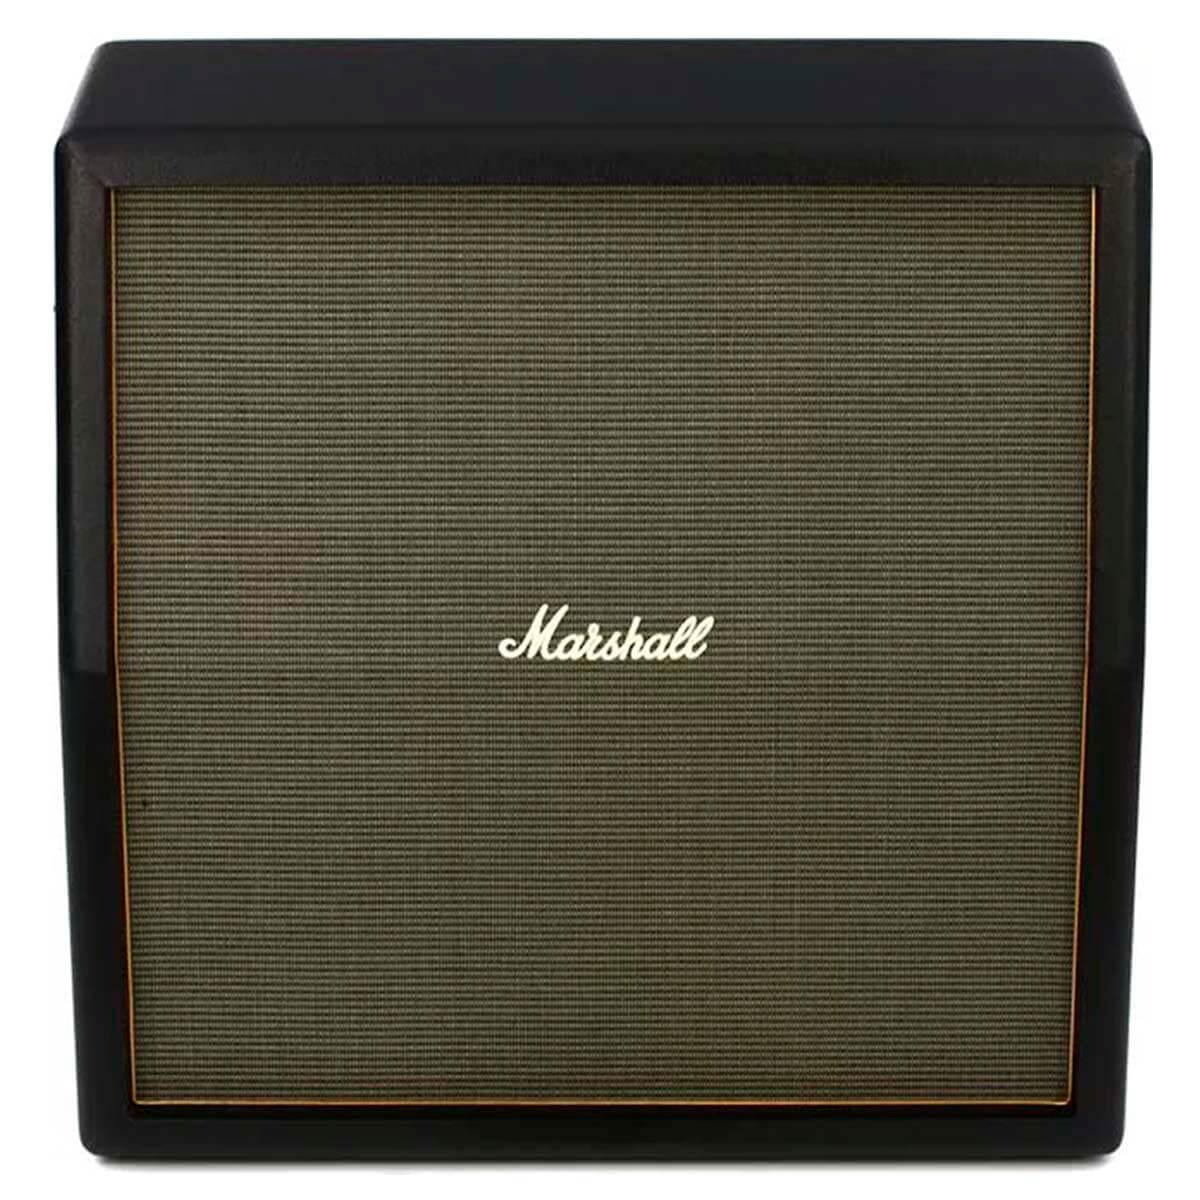 Gabinete Marshall ORI412A Origin 240W 4x12 para Guitarra